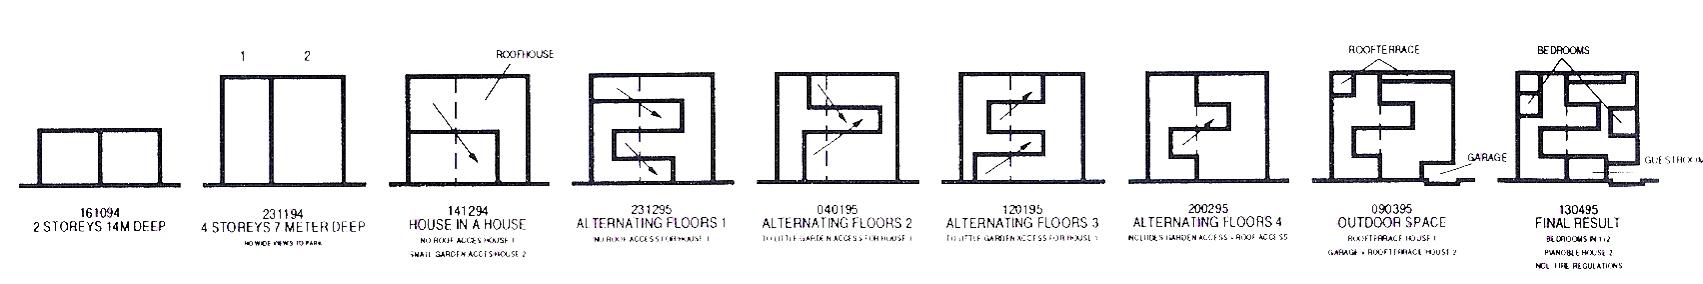 Mvrdv le corbusier and the ultimate inspiration building le corbusier - Unite d habitation dimensions ...